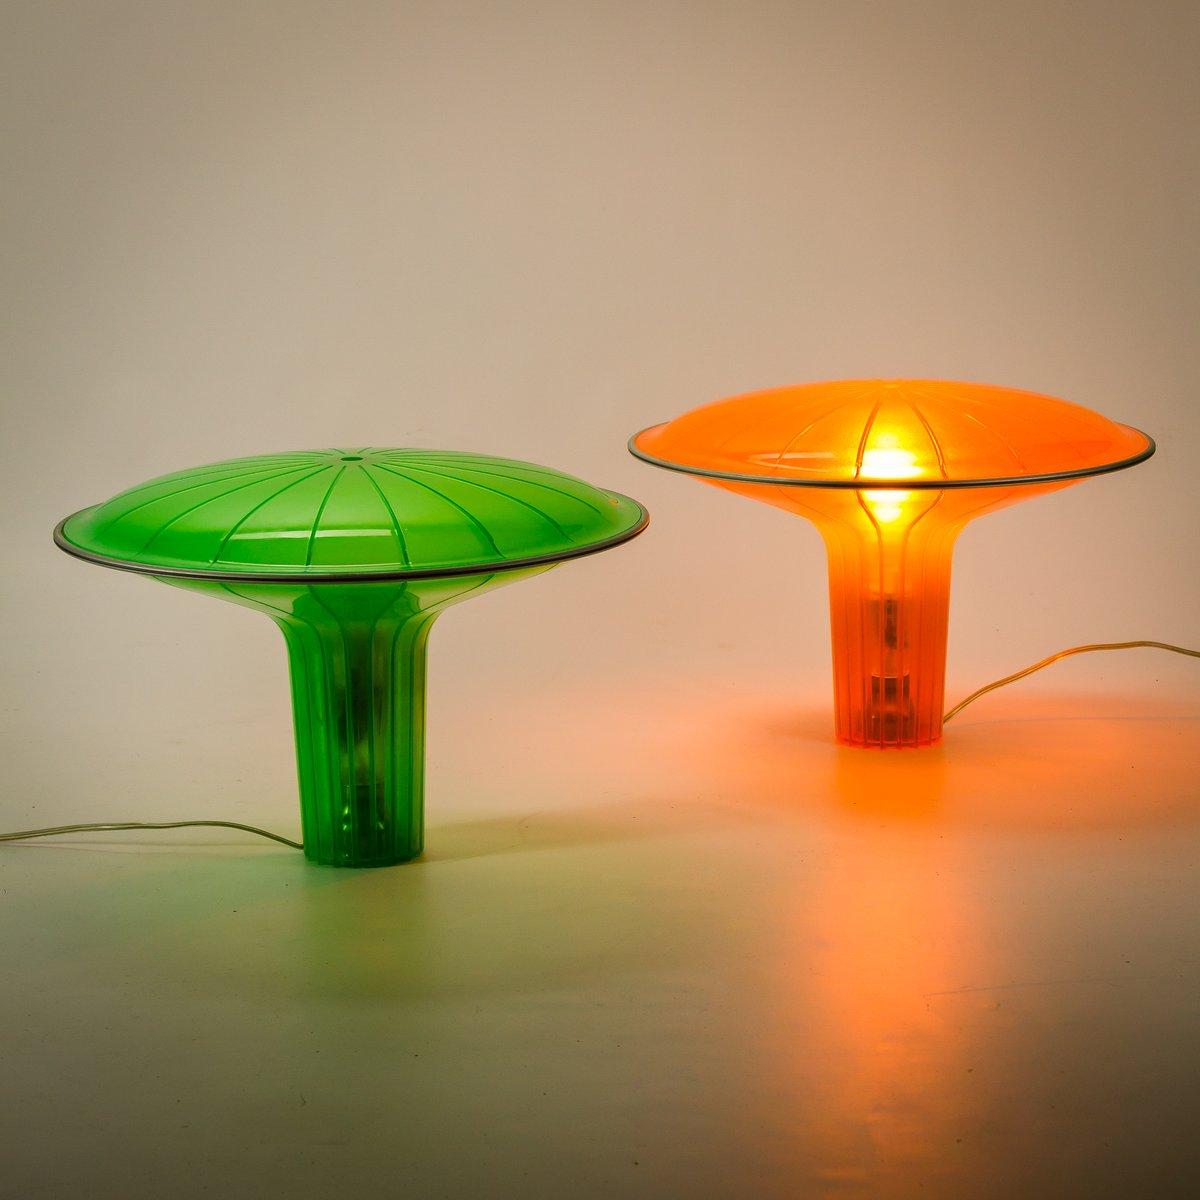 Bdlove Lamp By Ross Lovegrove · Https://cdn1.pamono.com/p/z/1/